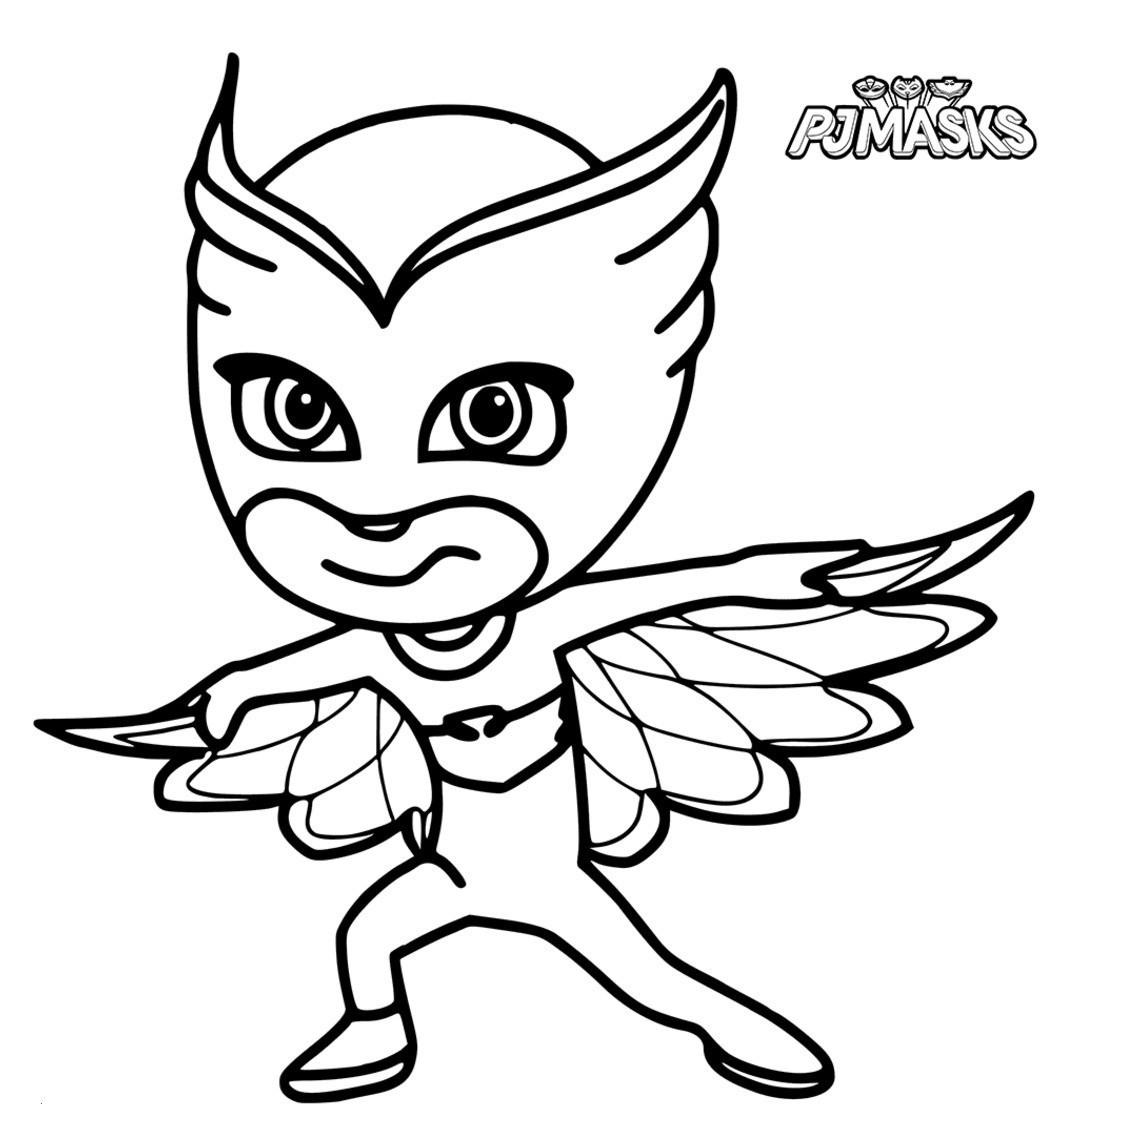 Pj Mask Ausmalbild Genial Ausmalbilder Pj Masks Inspirierend 12 Owlette Coloring Page Schön Pj Das Bild